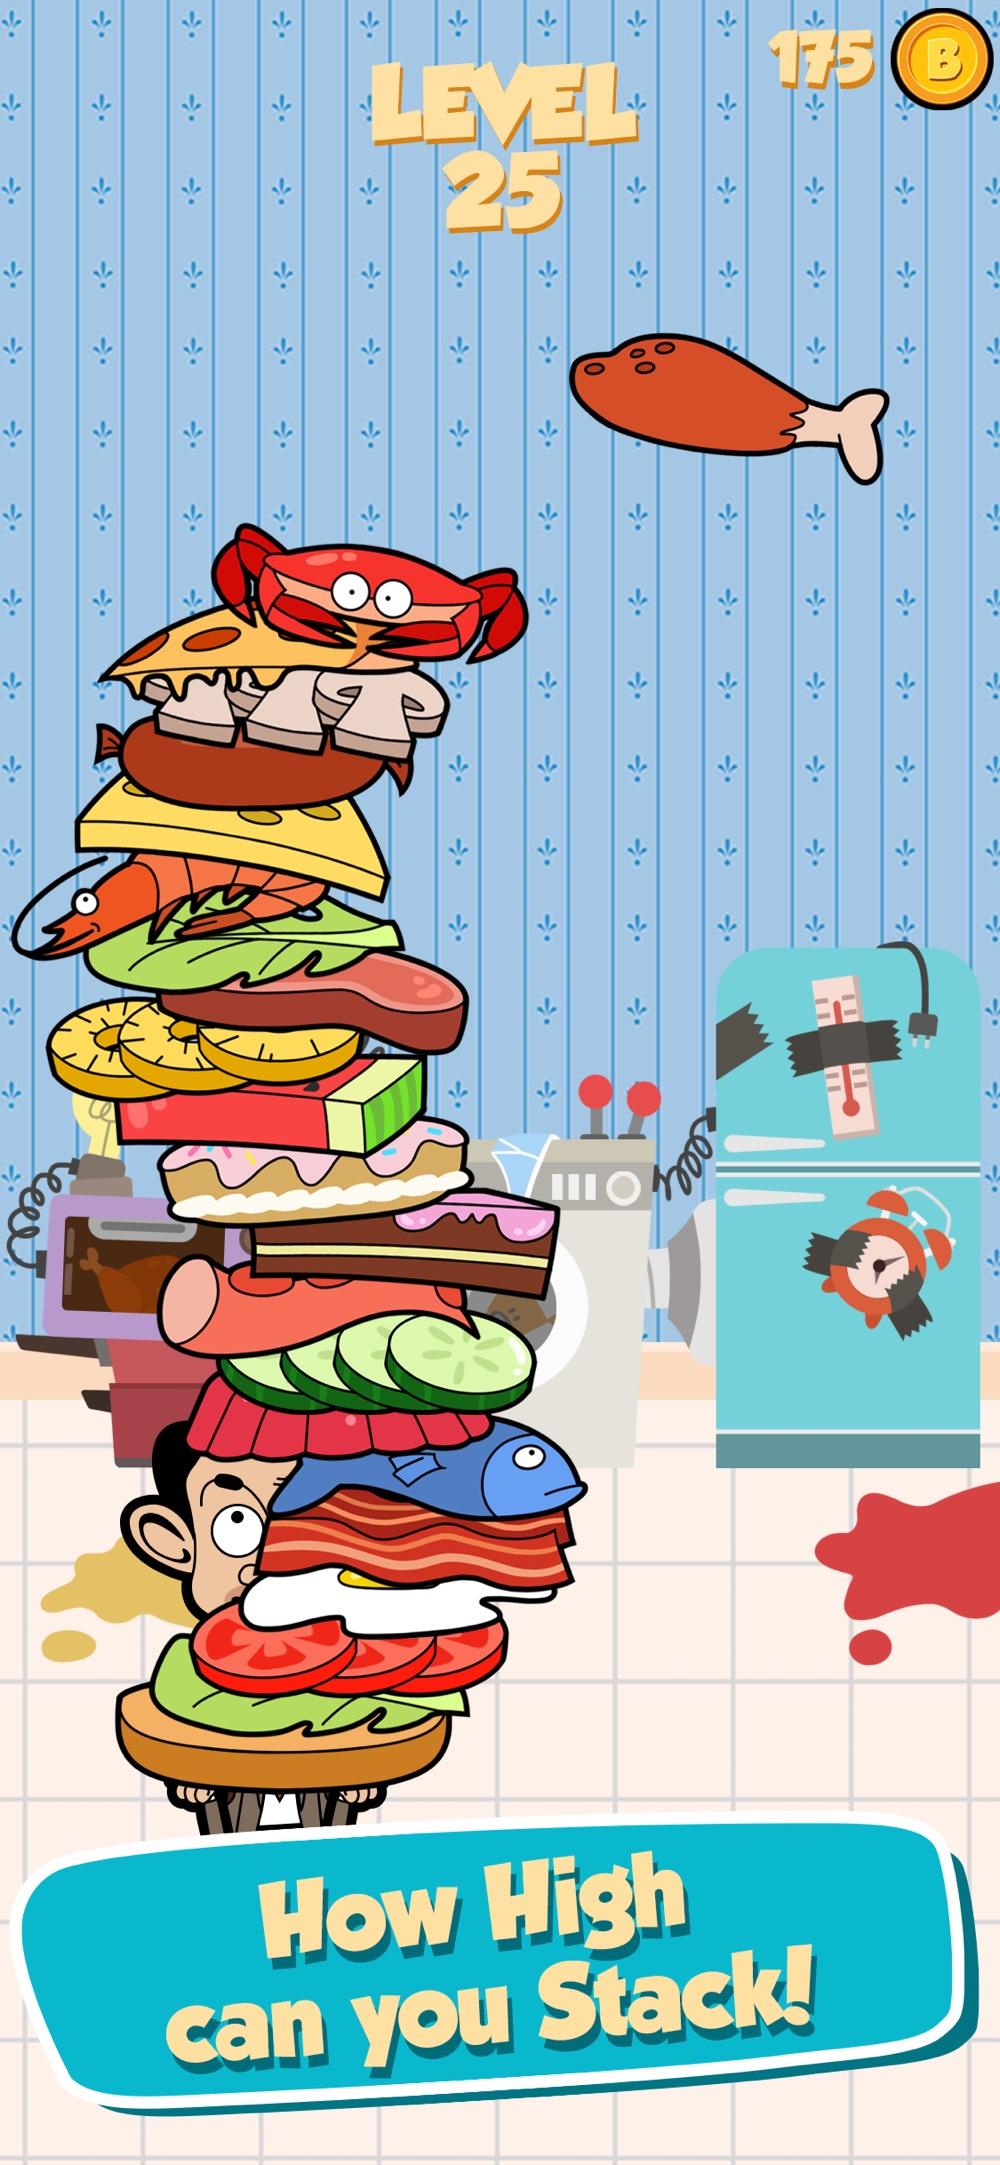 Mr Bean - Sandwich Stack hack tool